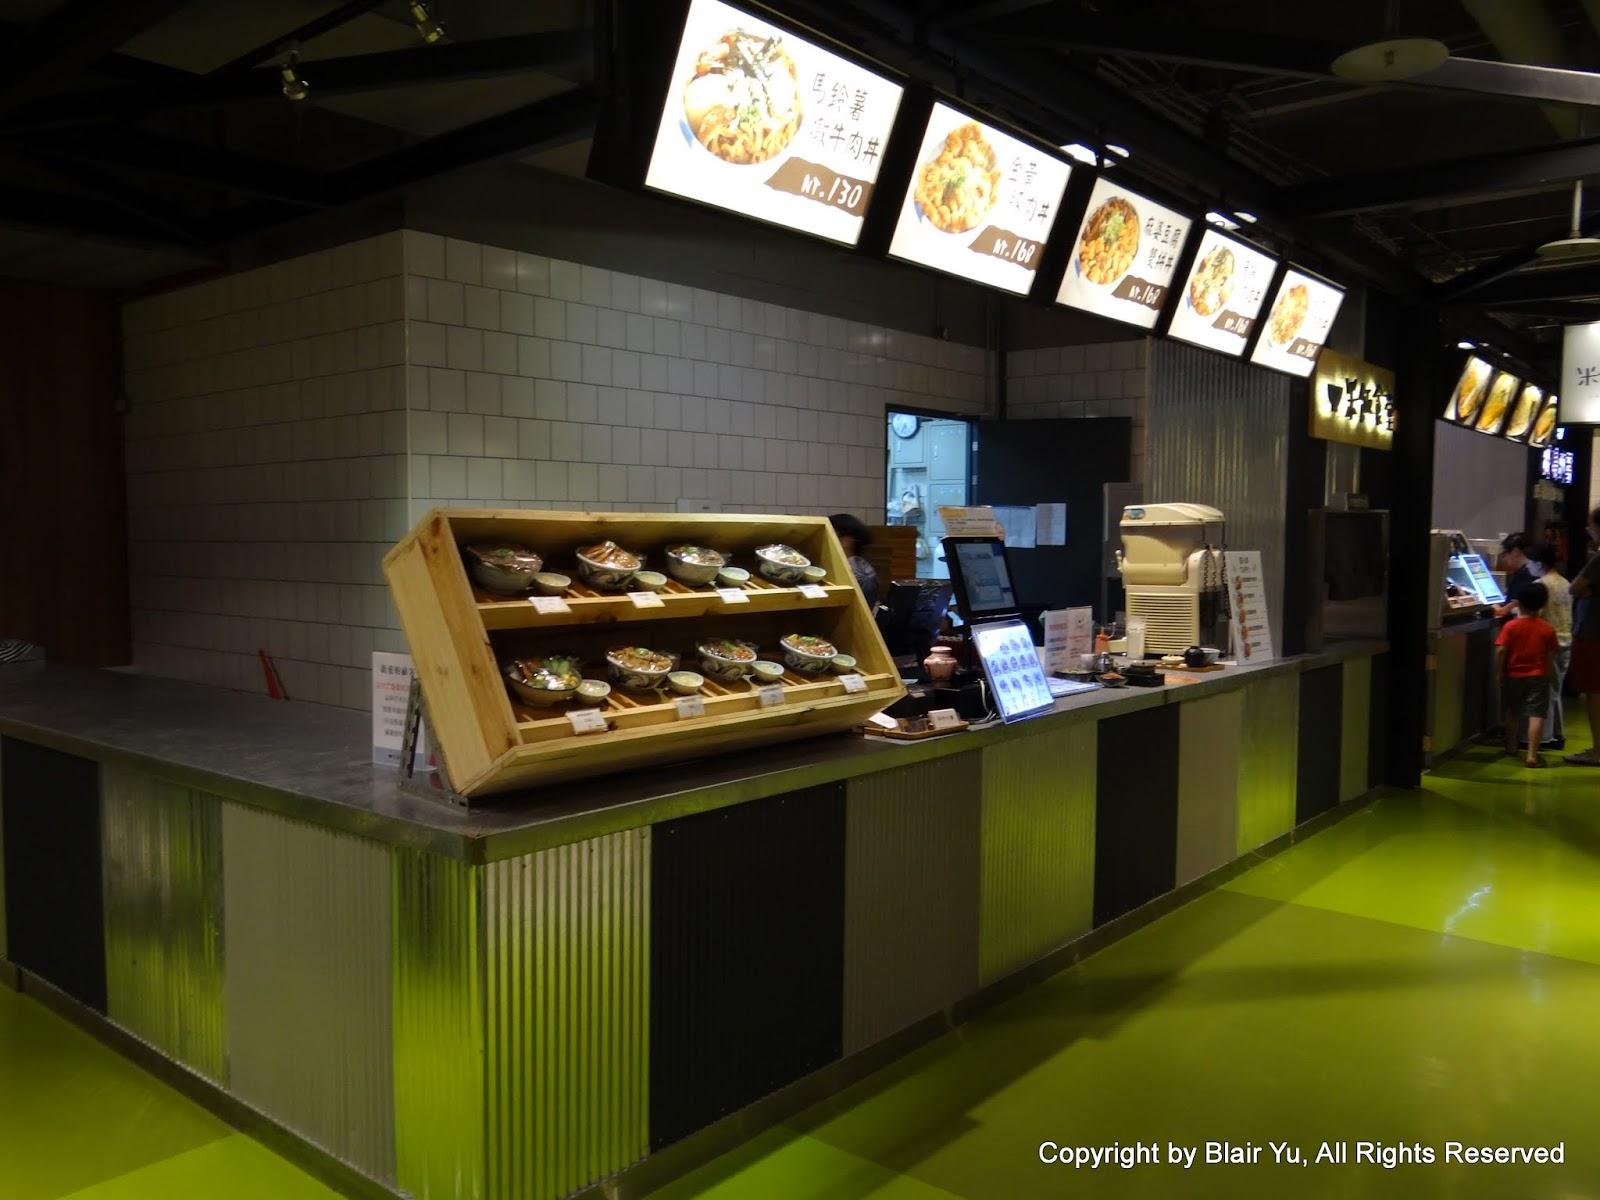 Blair and Kate's 旅遊與美食: 新竹市景點與美食